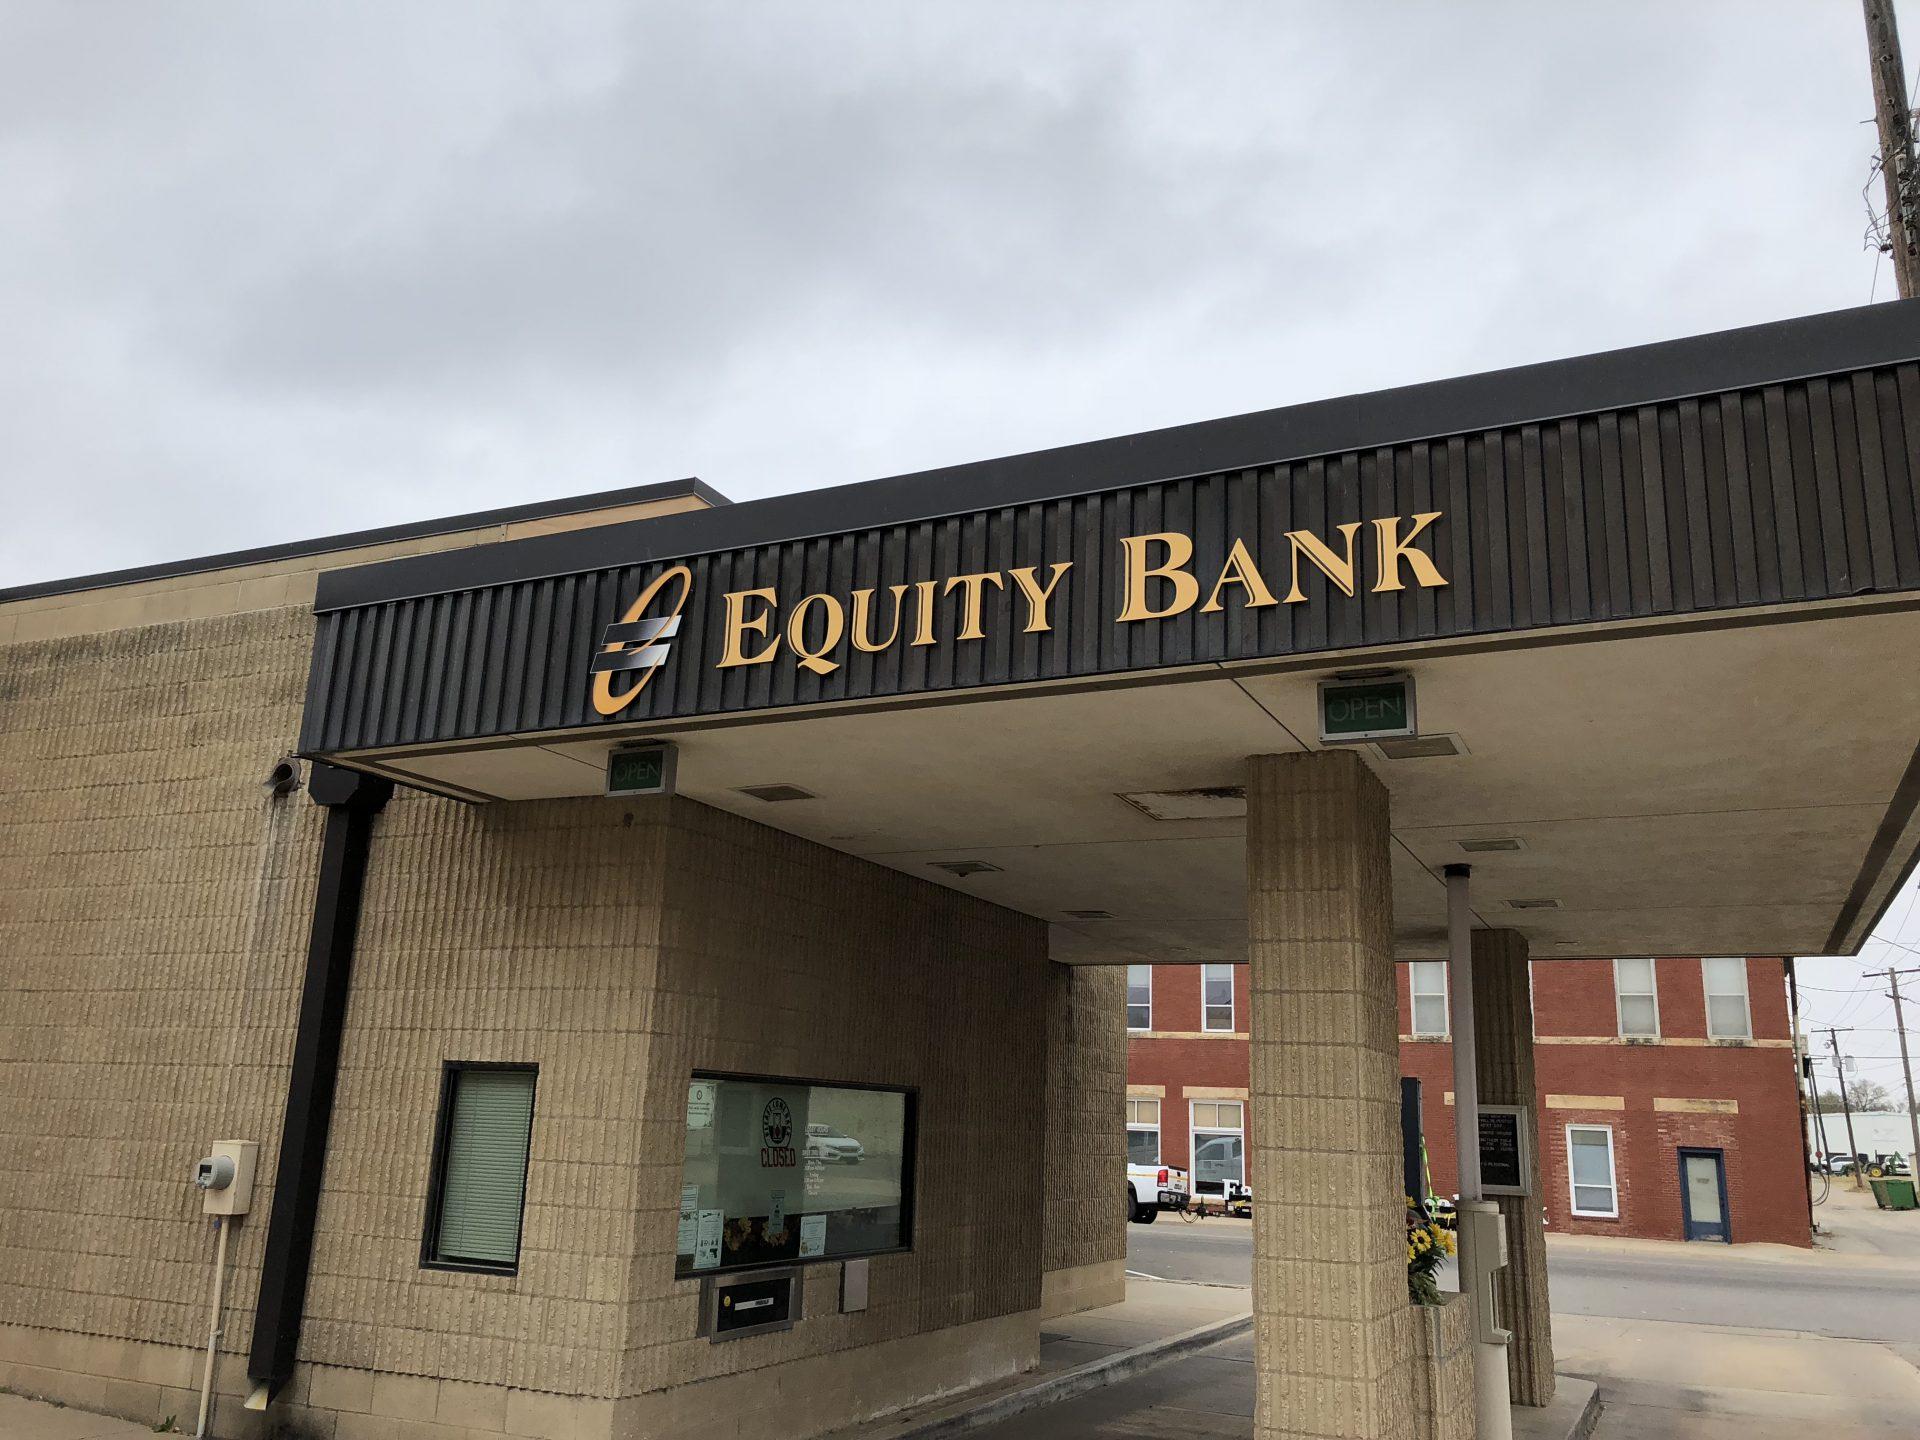 Equity Bank Ponca City Plaza branch exterior.